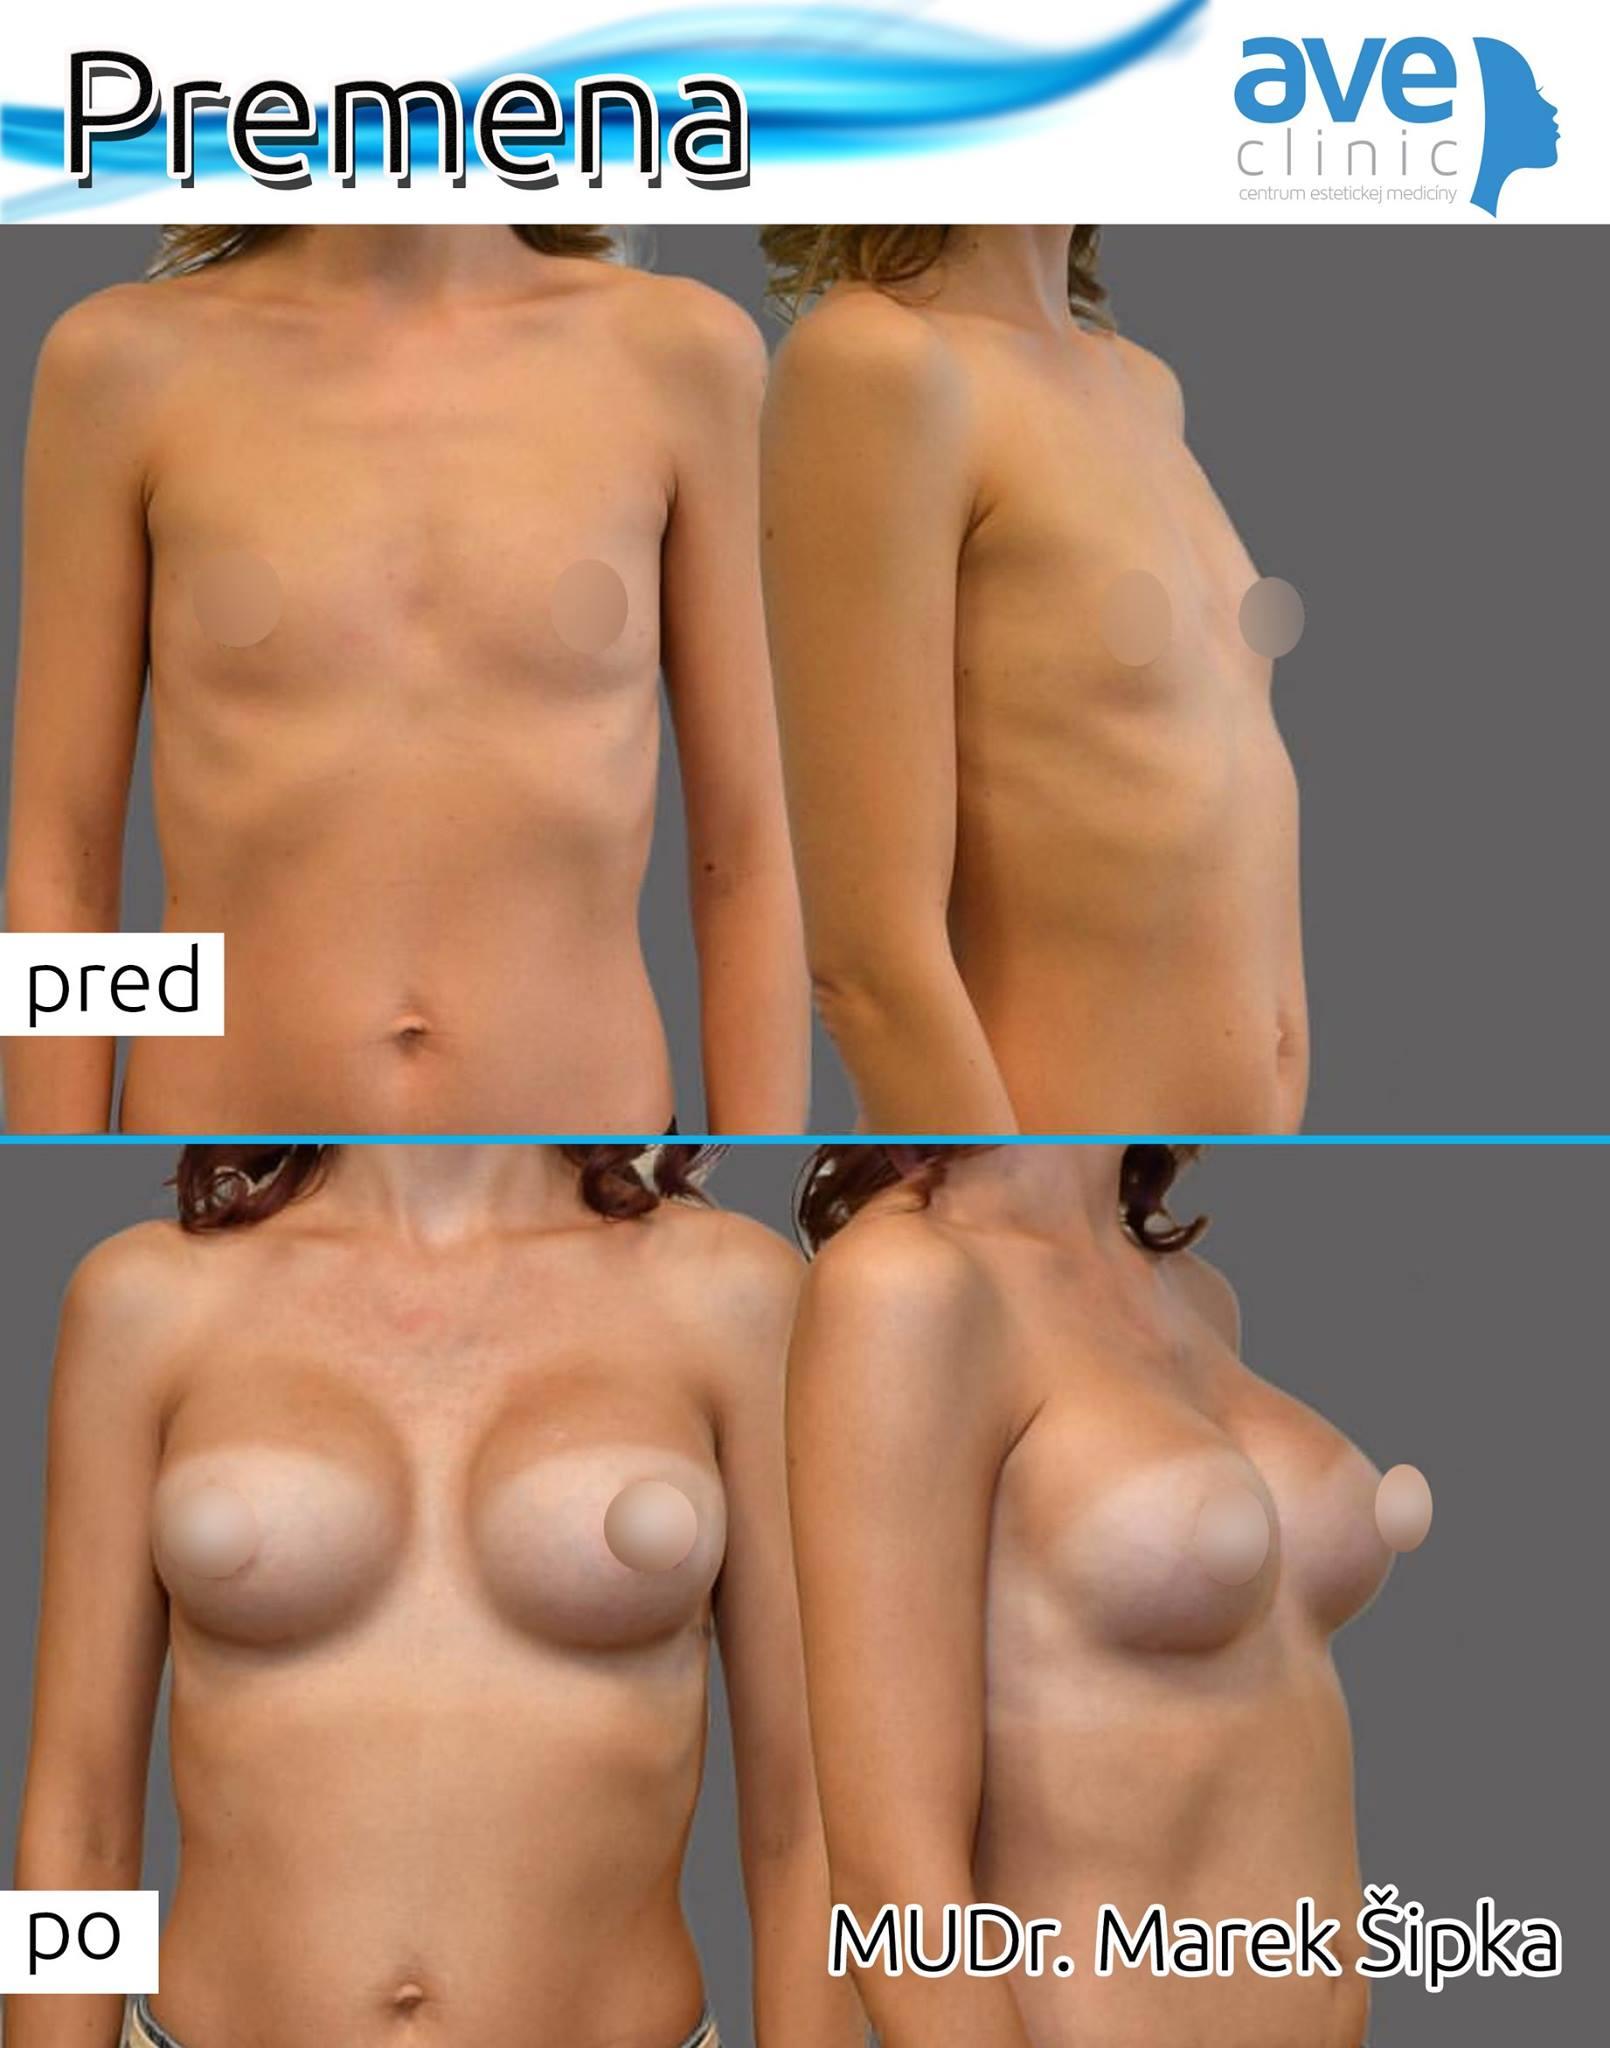 premena prsia sipka